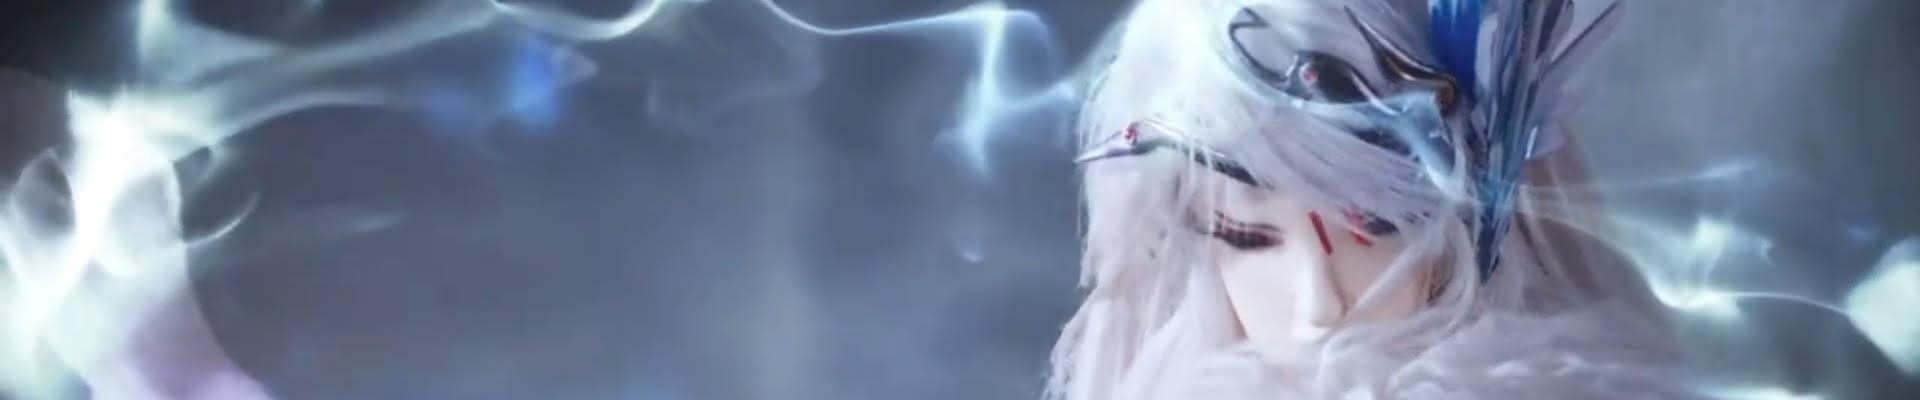 Thunderbolt Fantasy - Touriken Yuuki